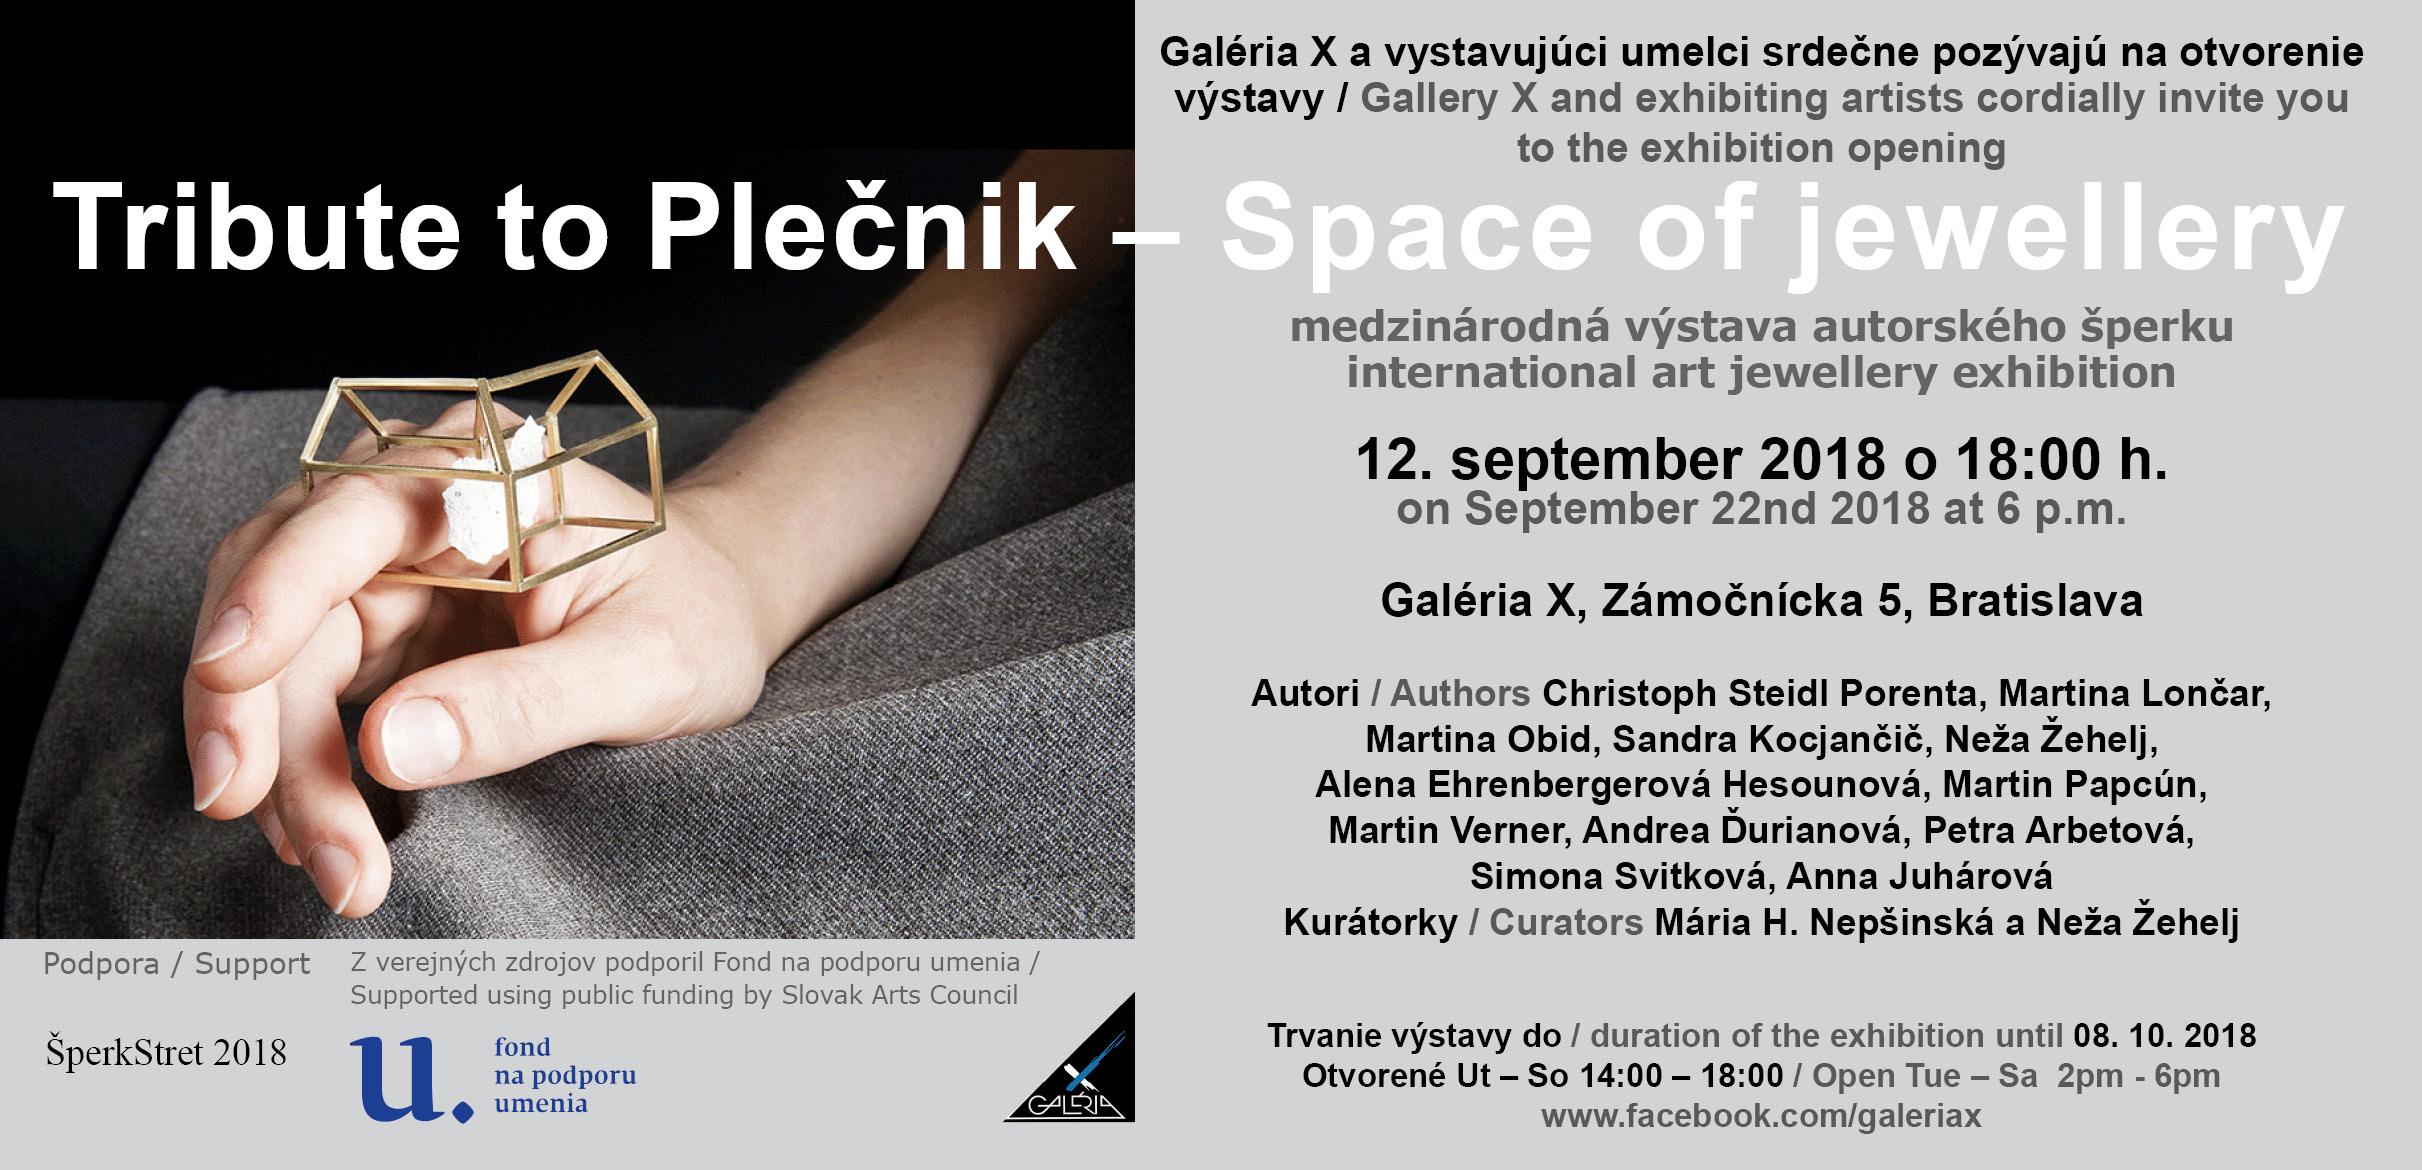 Tribute to Plečnik - Curated International exhibition Space of jewellery12.September - 8.October 2018 / Bratislava / Slovakia